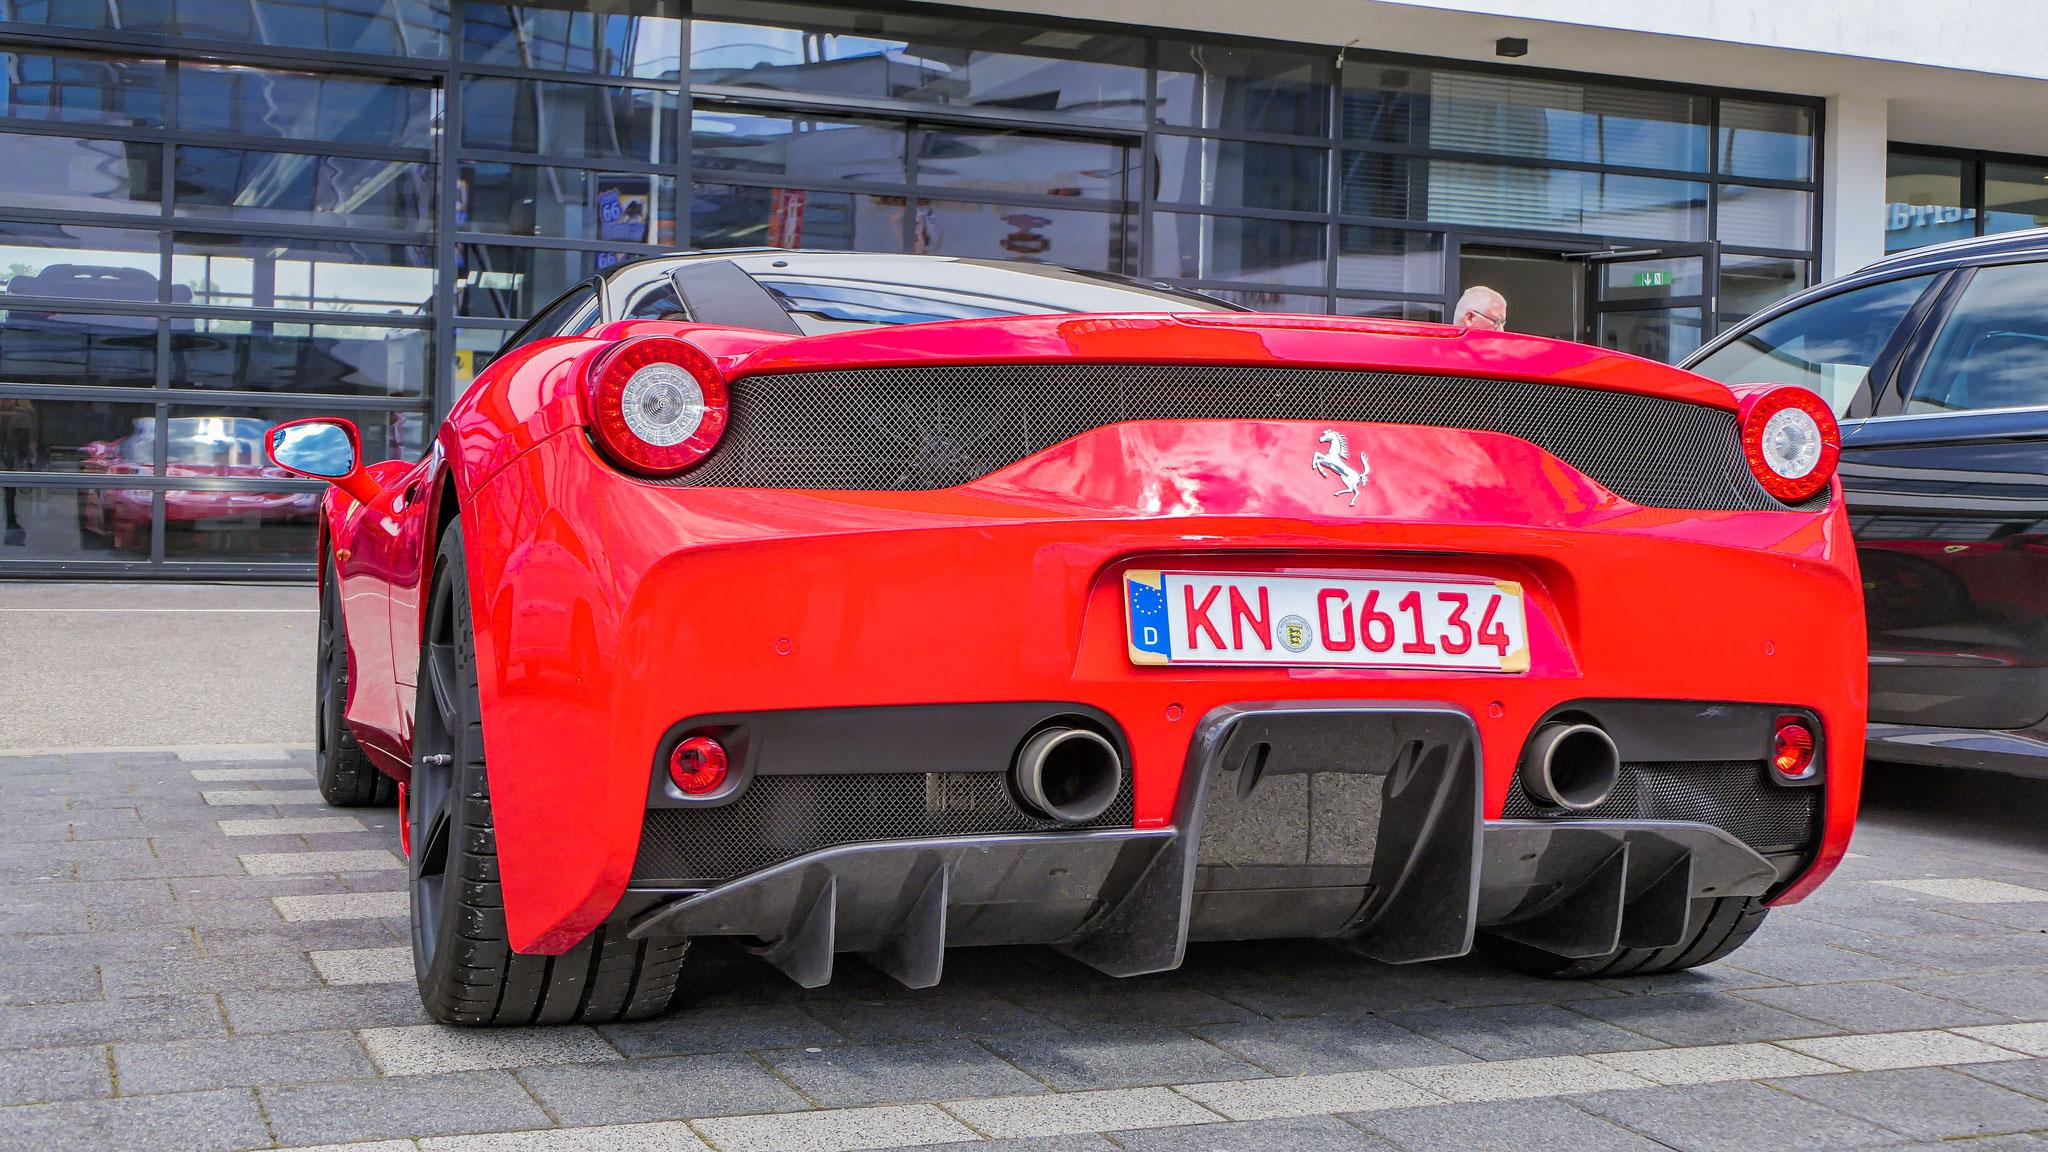 Ferrari 458 Speciale - KN-06134